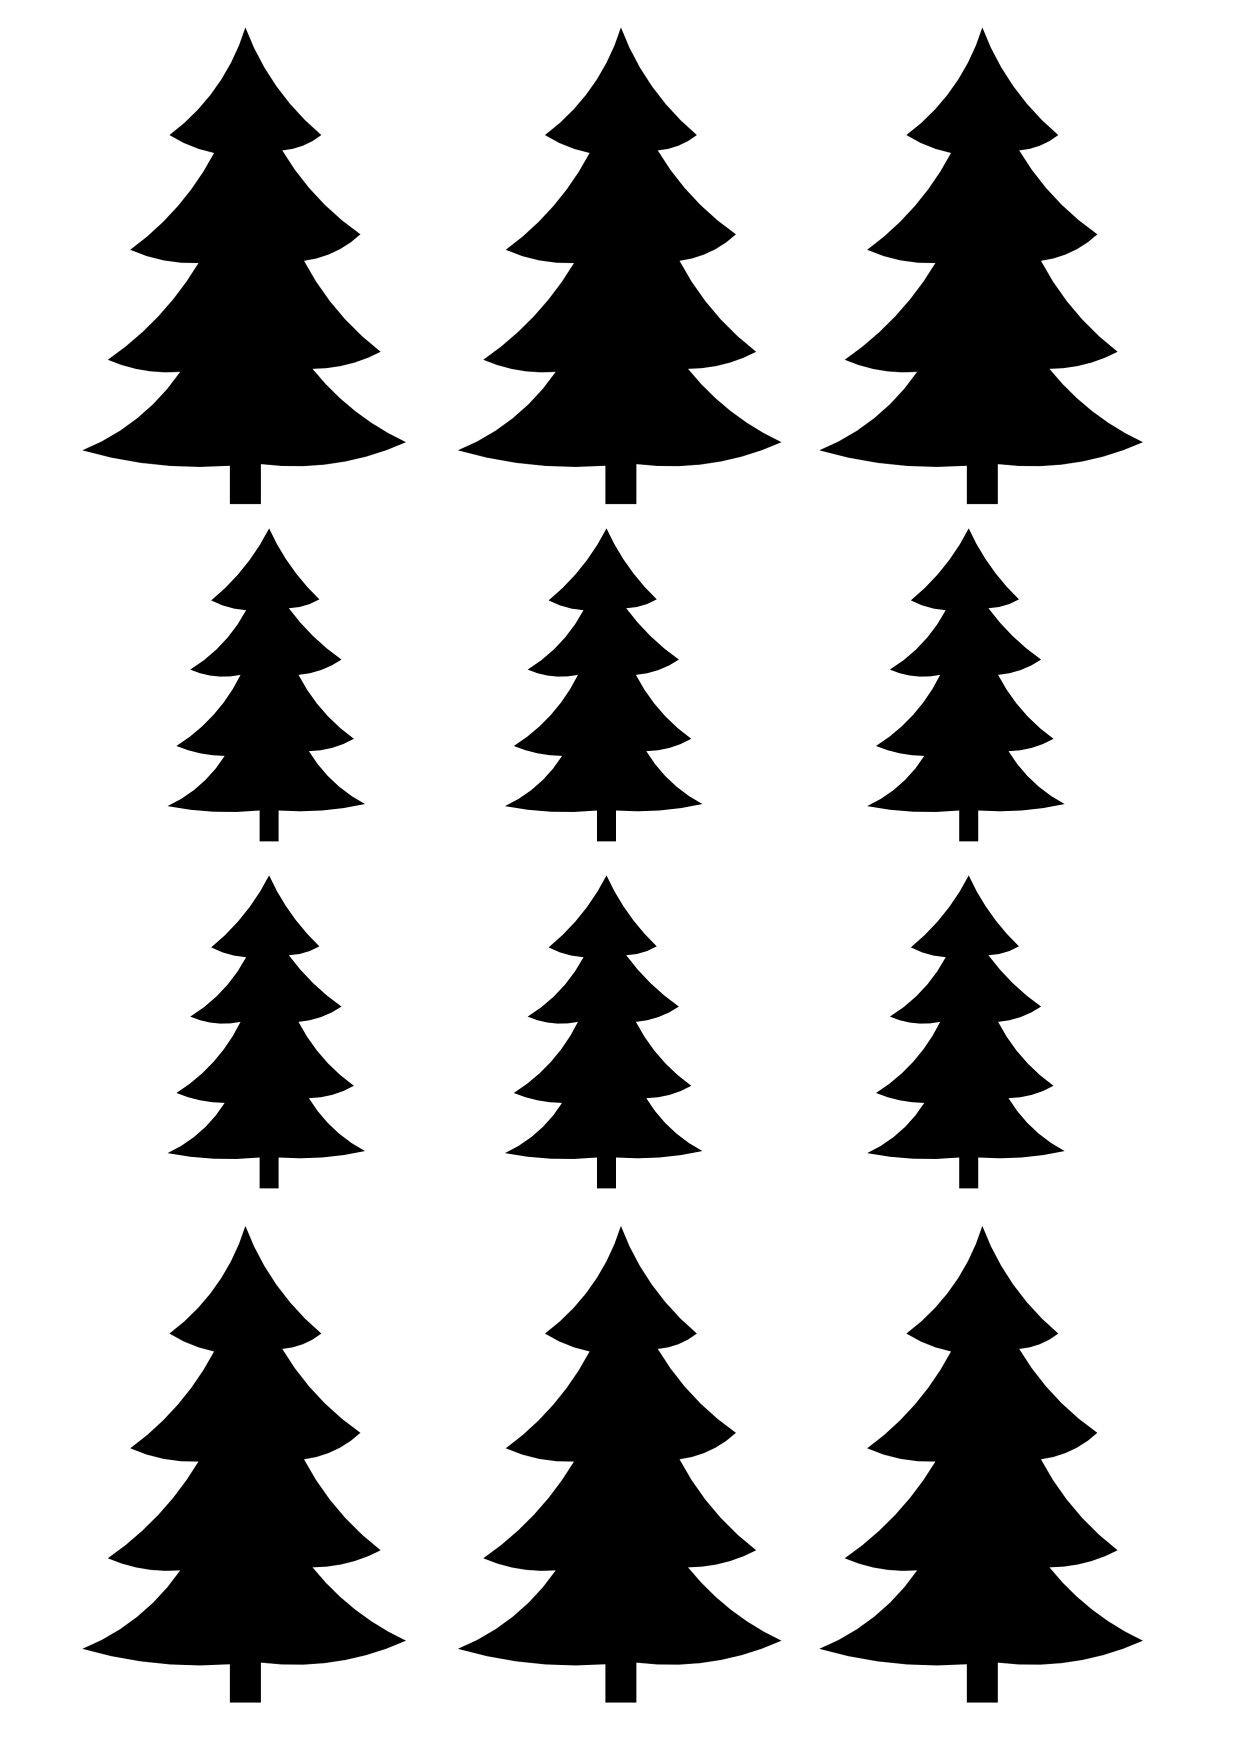 School Projects, Xmas Cards, Project Ideas, Cricut, Xmas, Christmas Cards,